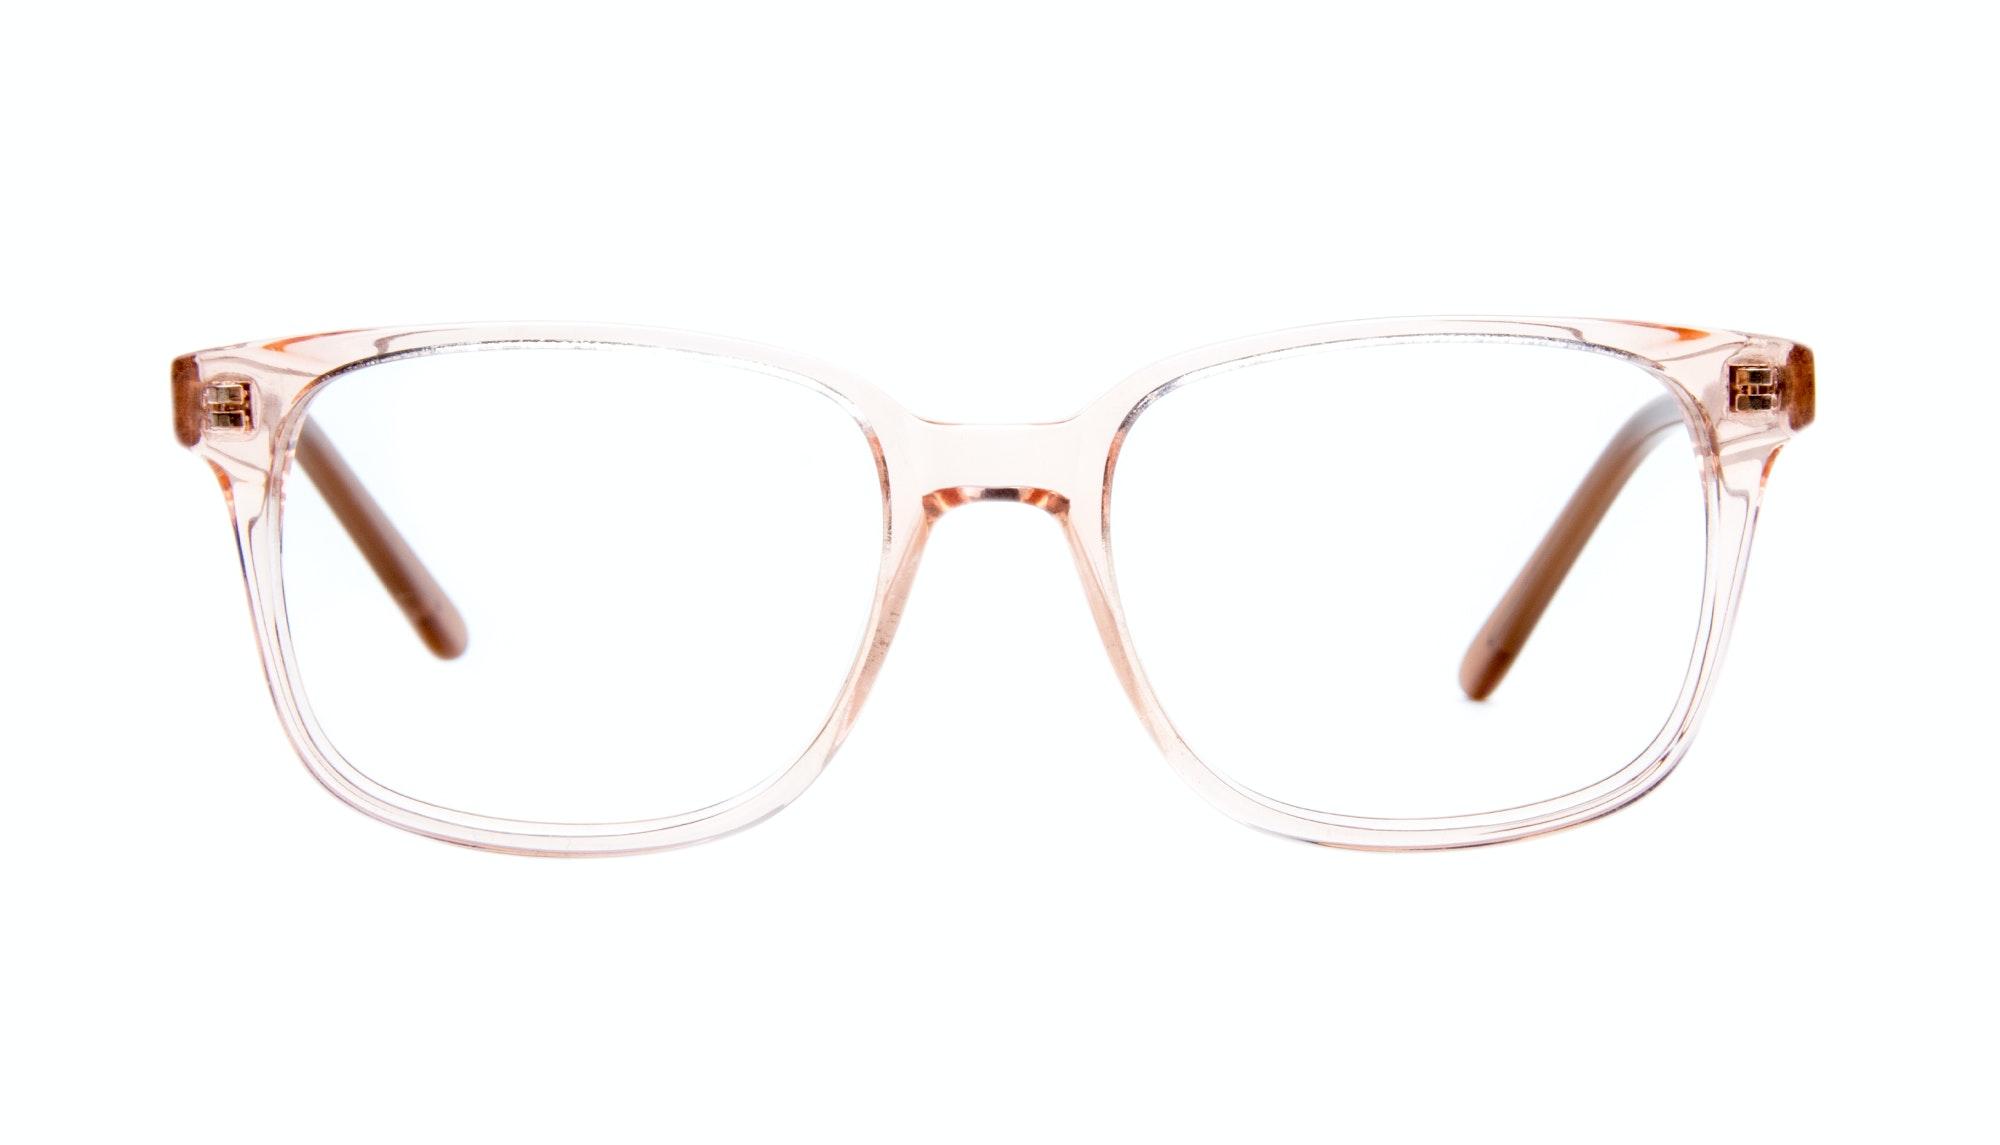 Affordable Fashion Glasses Rectangle Square Eyeglasses Women Windsor Pink Metal Front